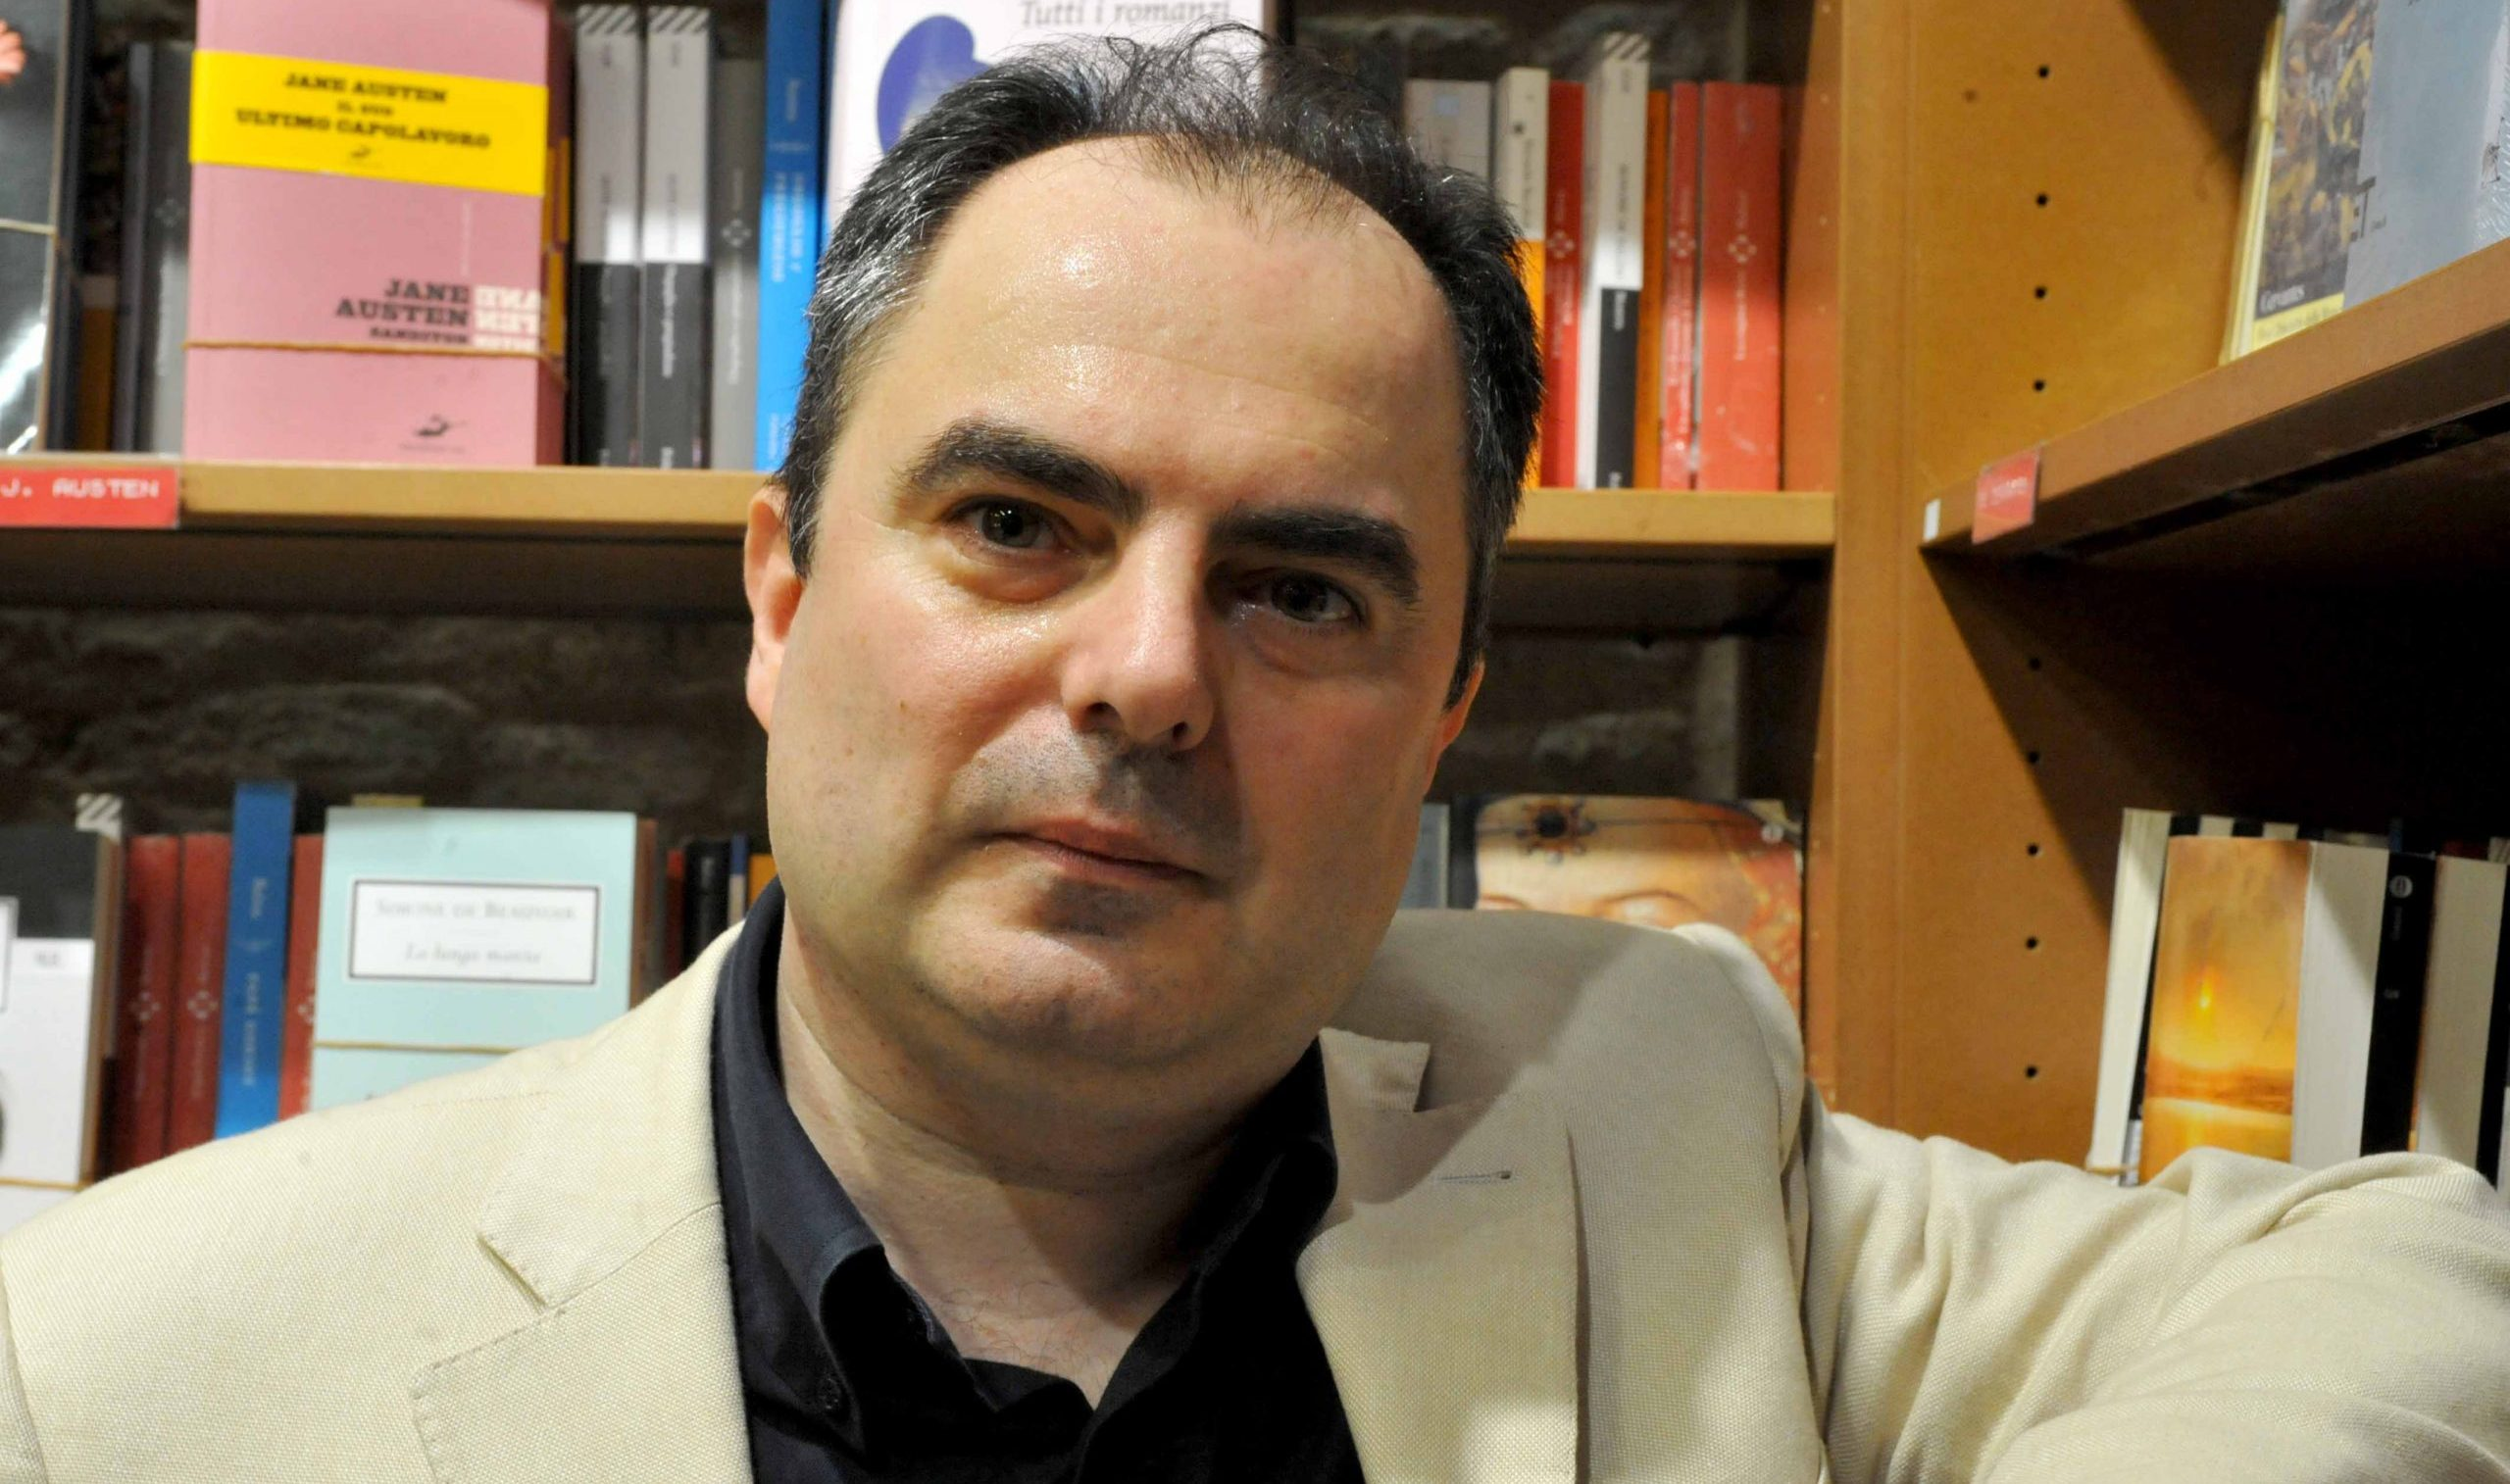 Professor Giovanni Ziccardi